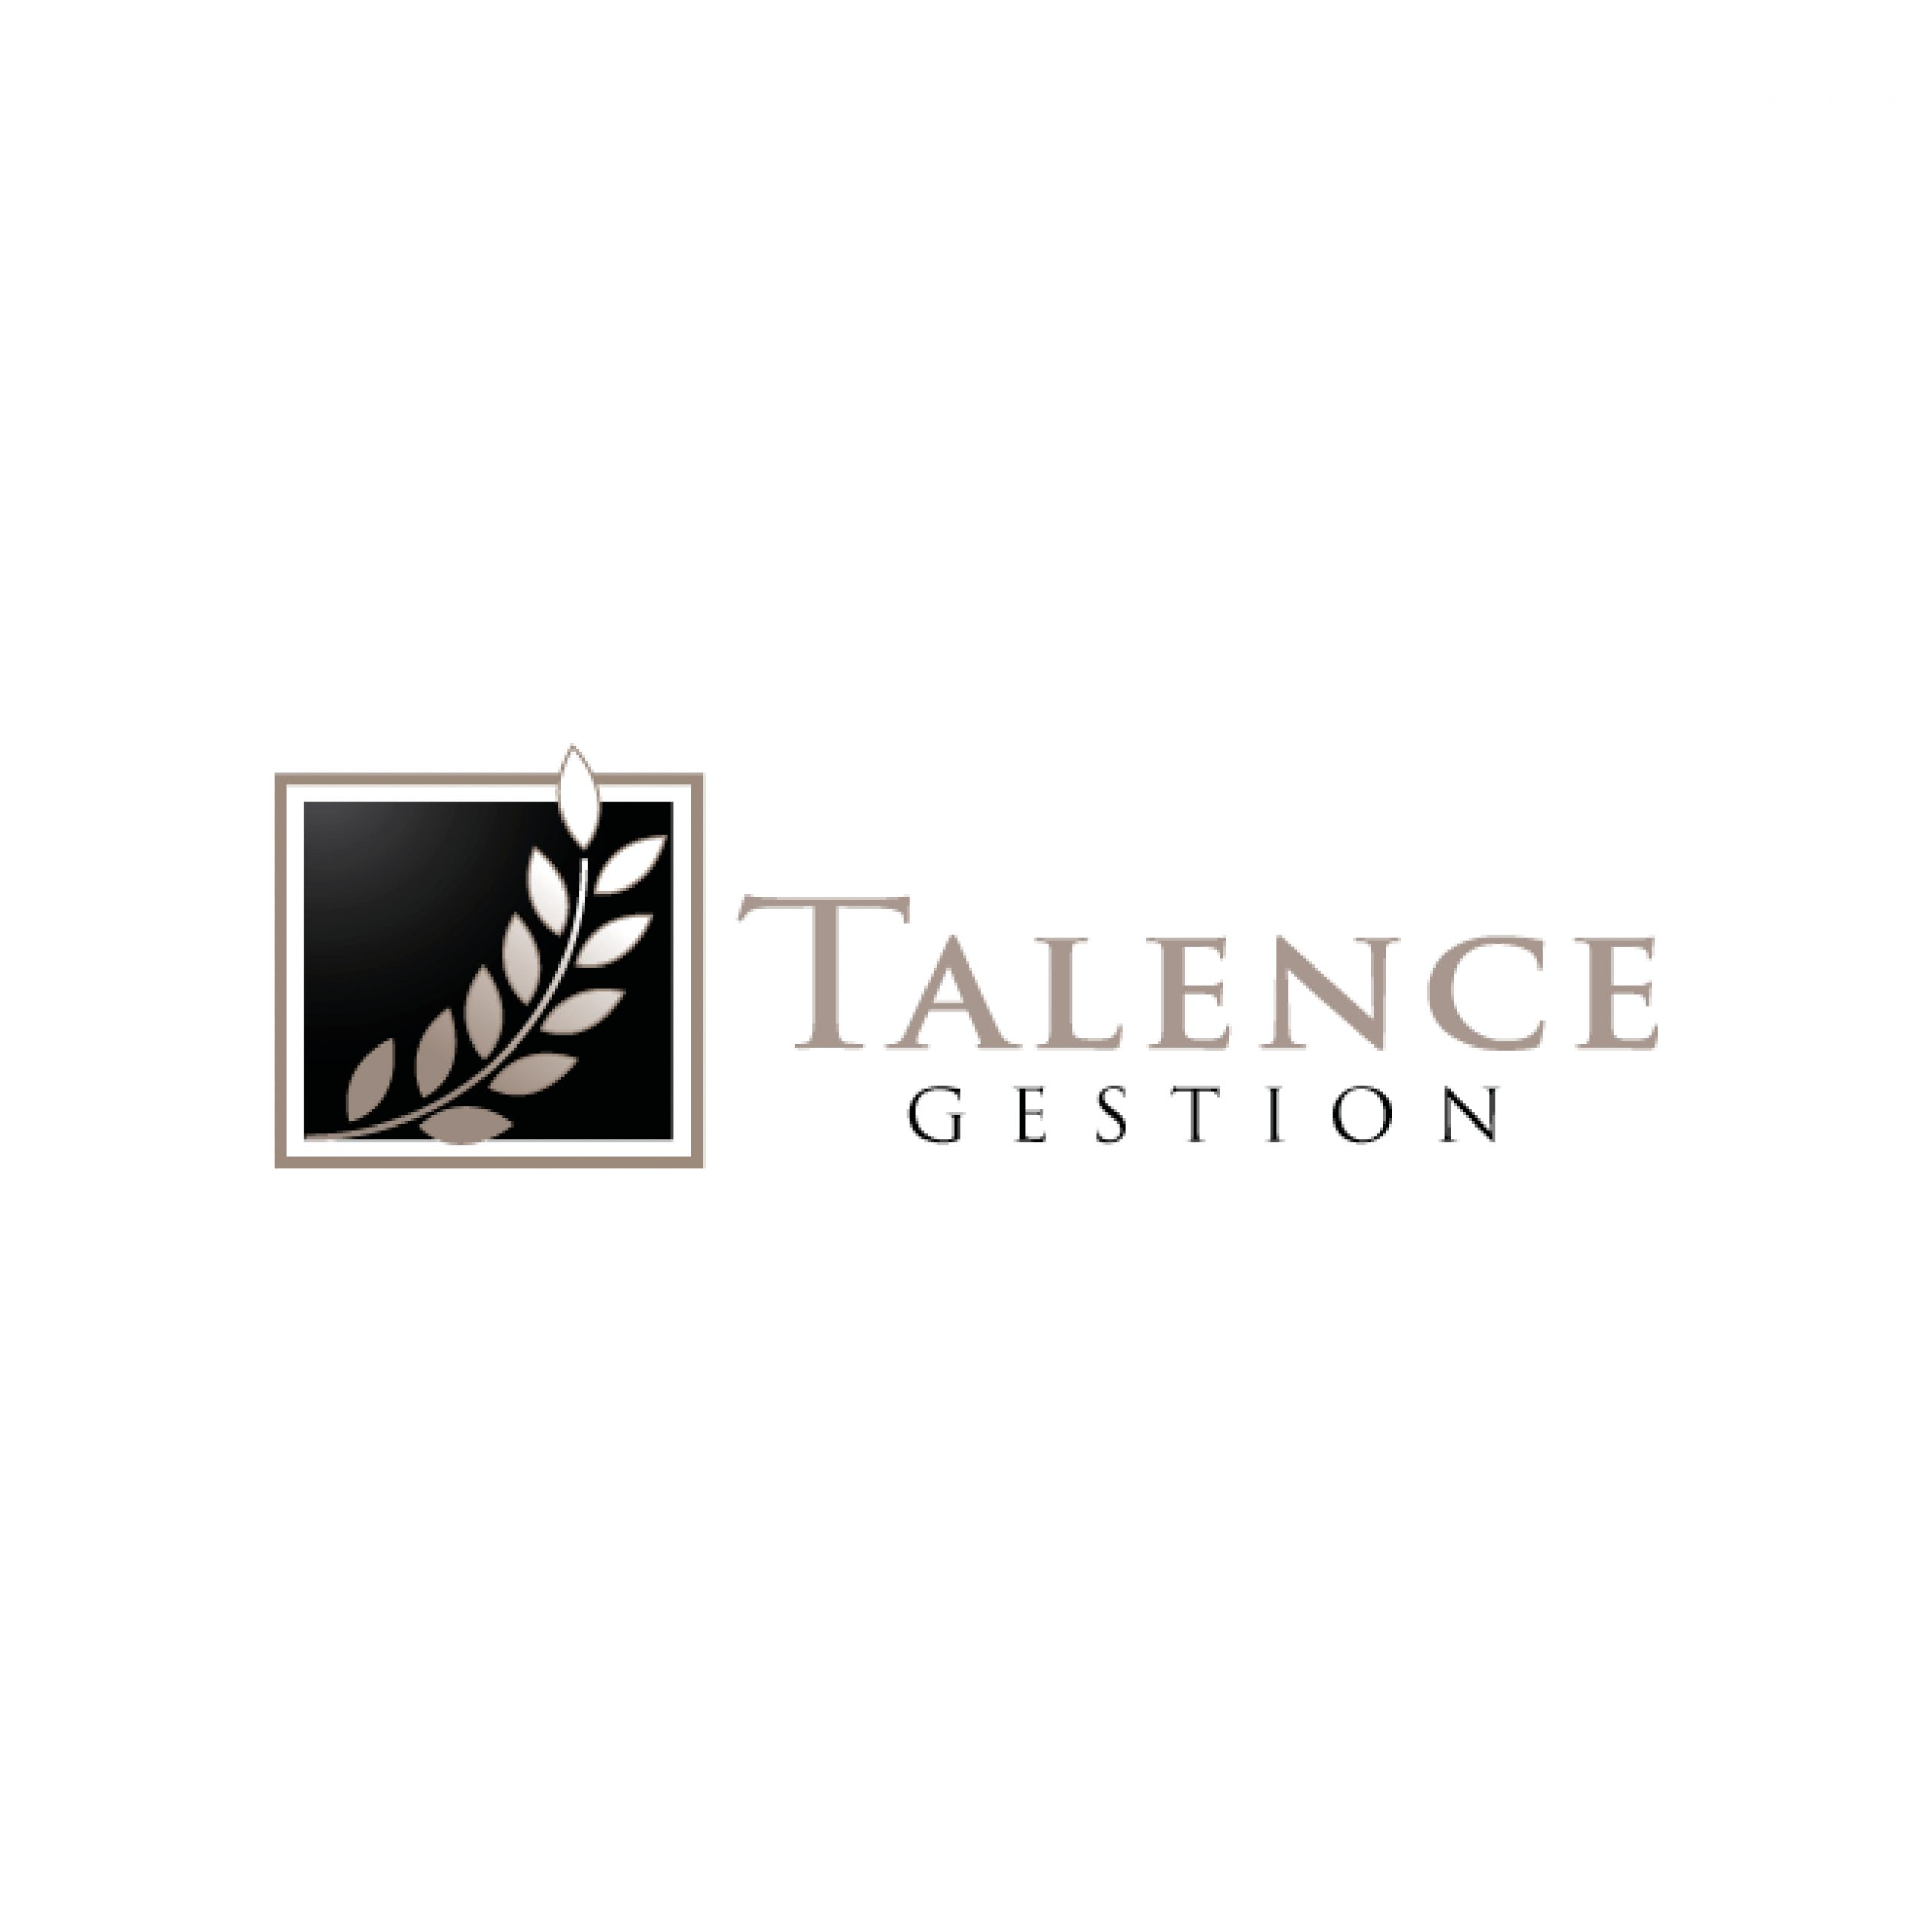 Talence